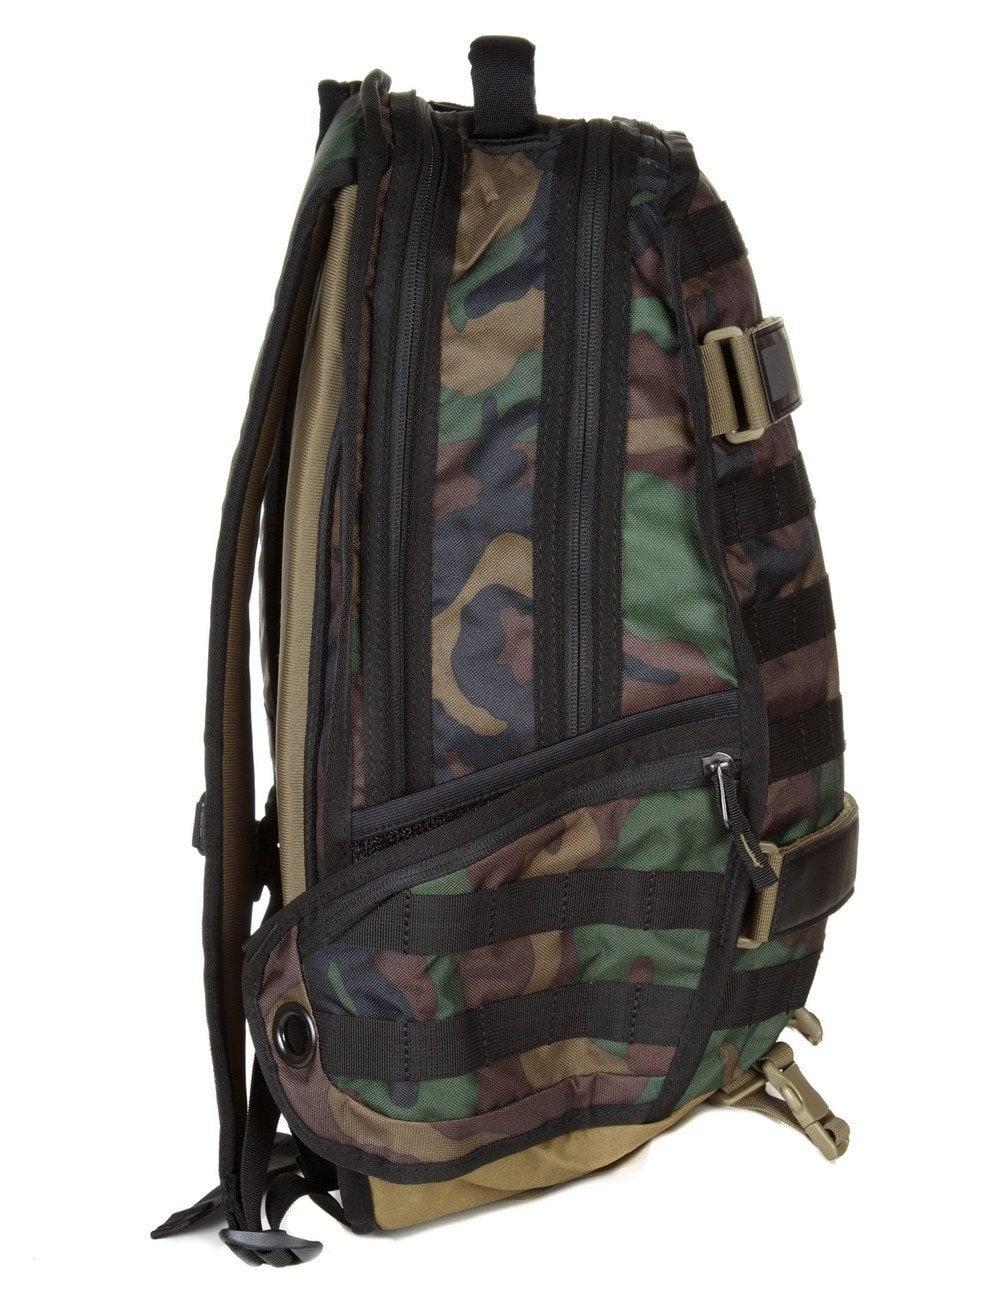 103c38a18d Nike SB RPM Backpack - Iguana Camo - Accessories from Fat Buddha ...